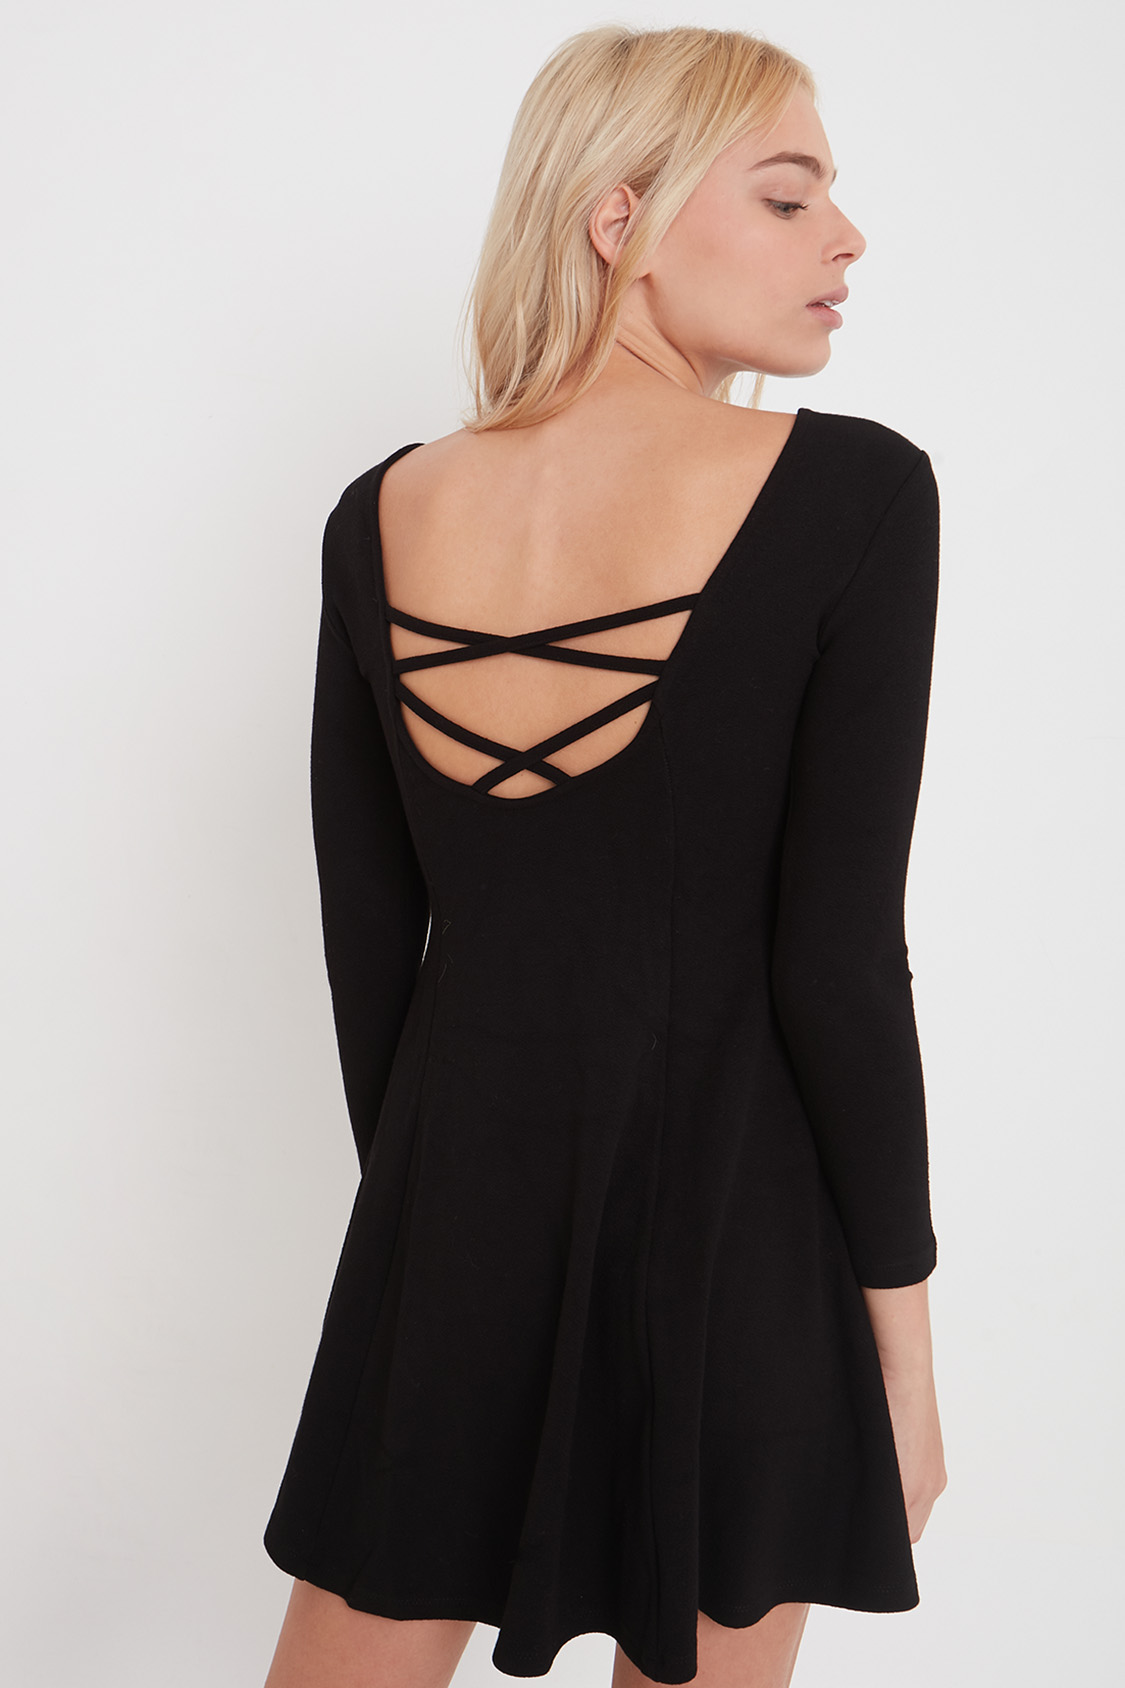 Back criss-cross dress